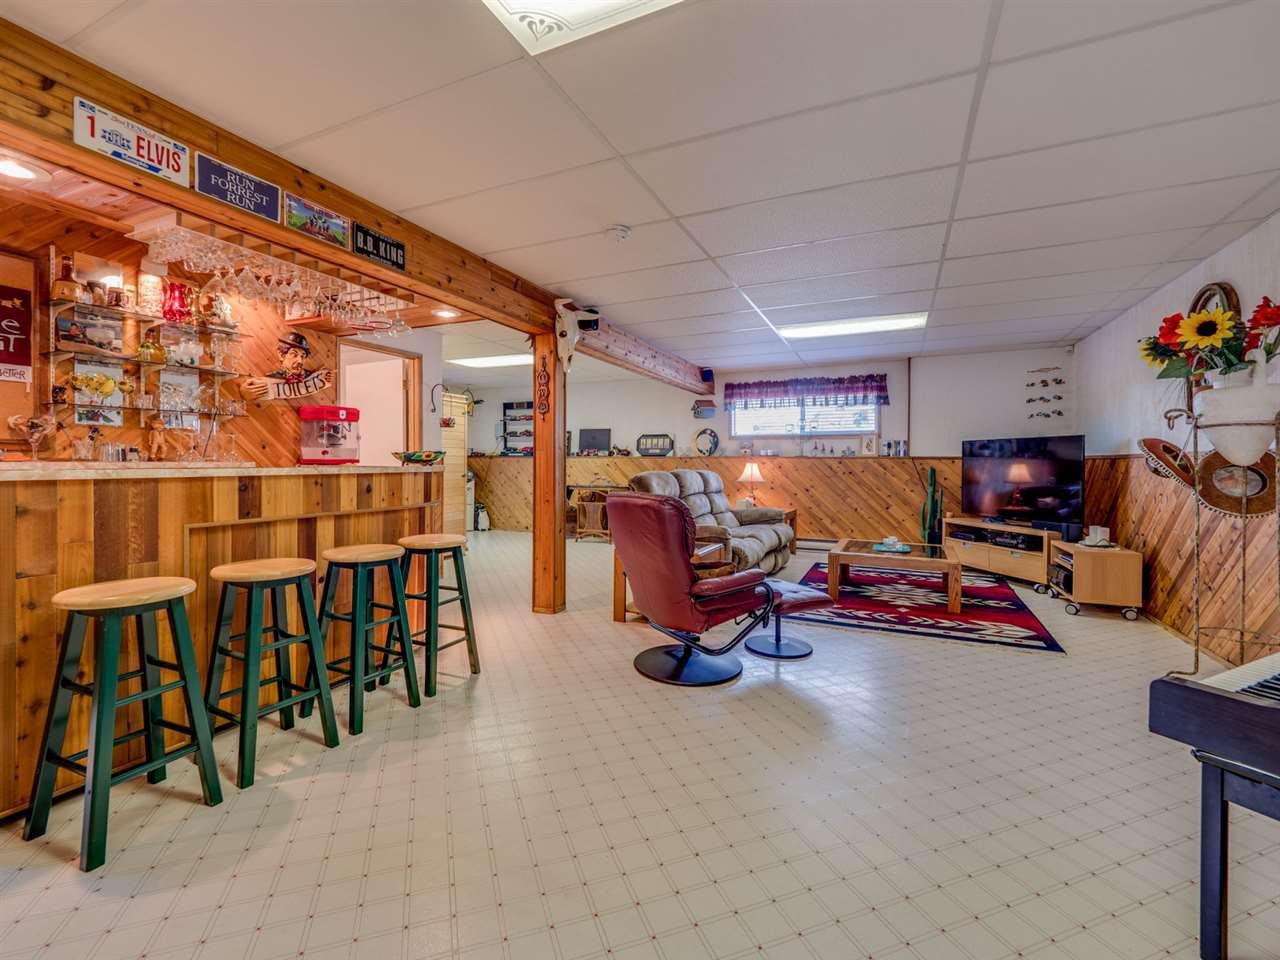 Photo 11: Photos: 4983 ARBUTUS Road in Sechelt: Sechelt District House for sale (Sunshine Coast)  : MLS®# R2427502